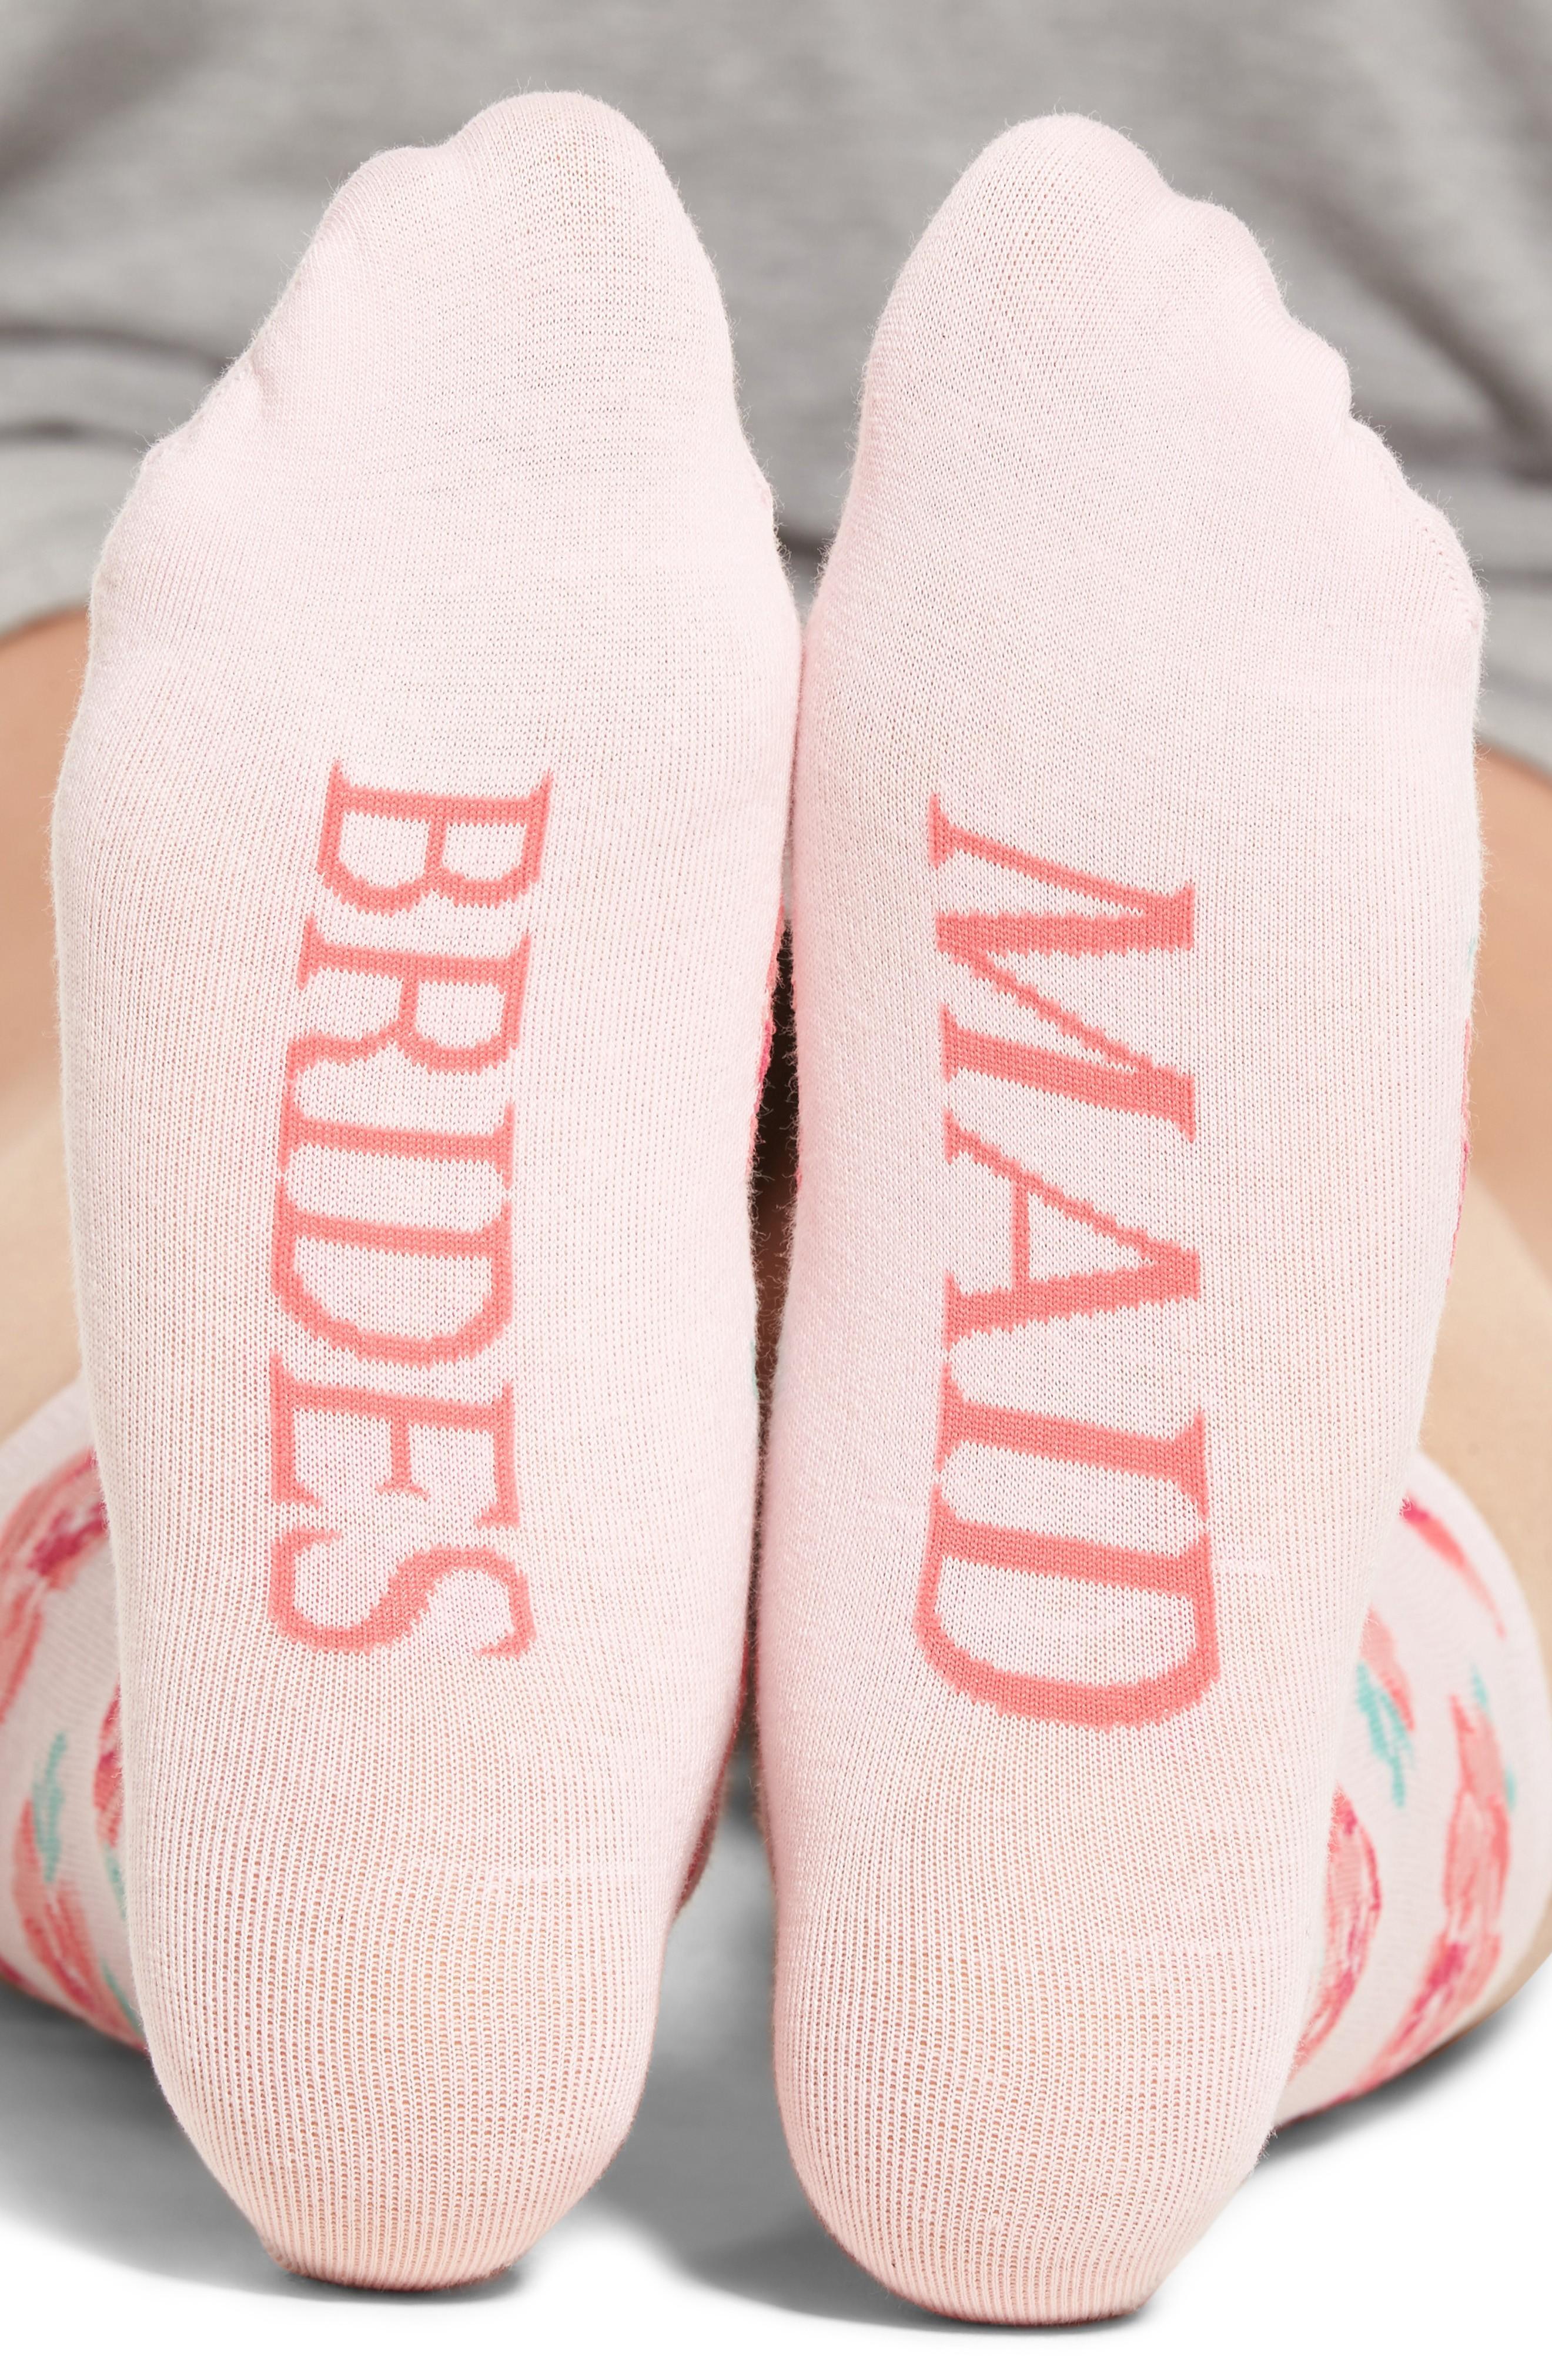 Sockart Bridesmaid Crew Socks In Light Pink